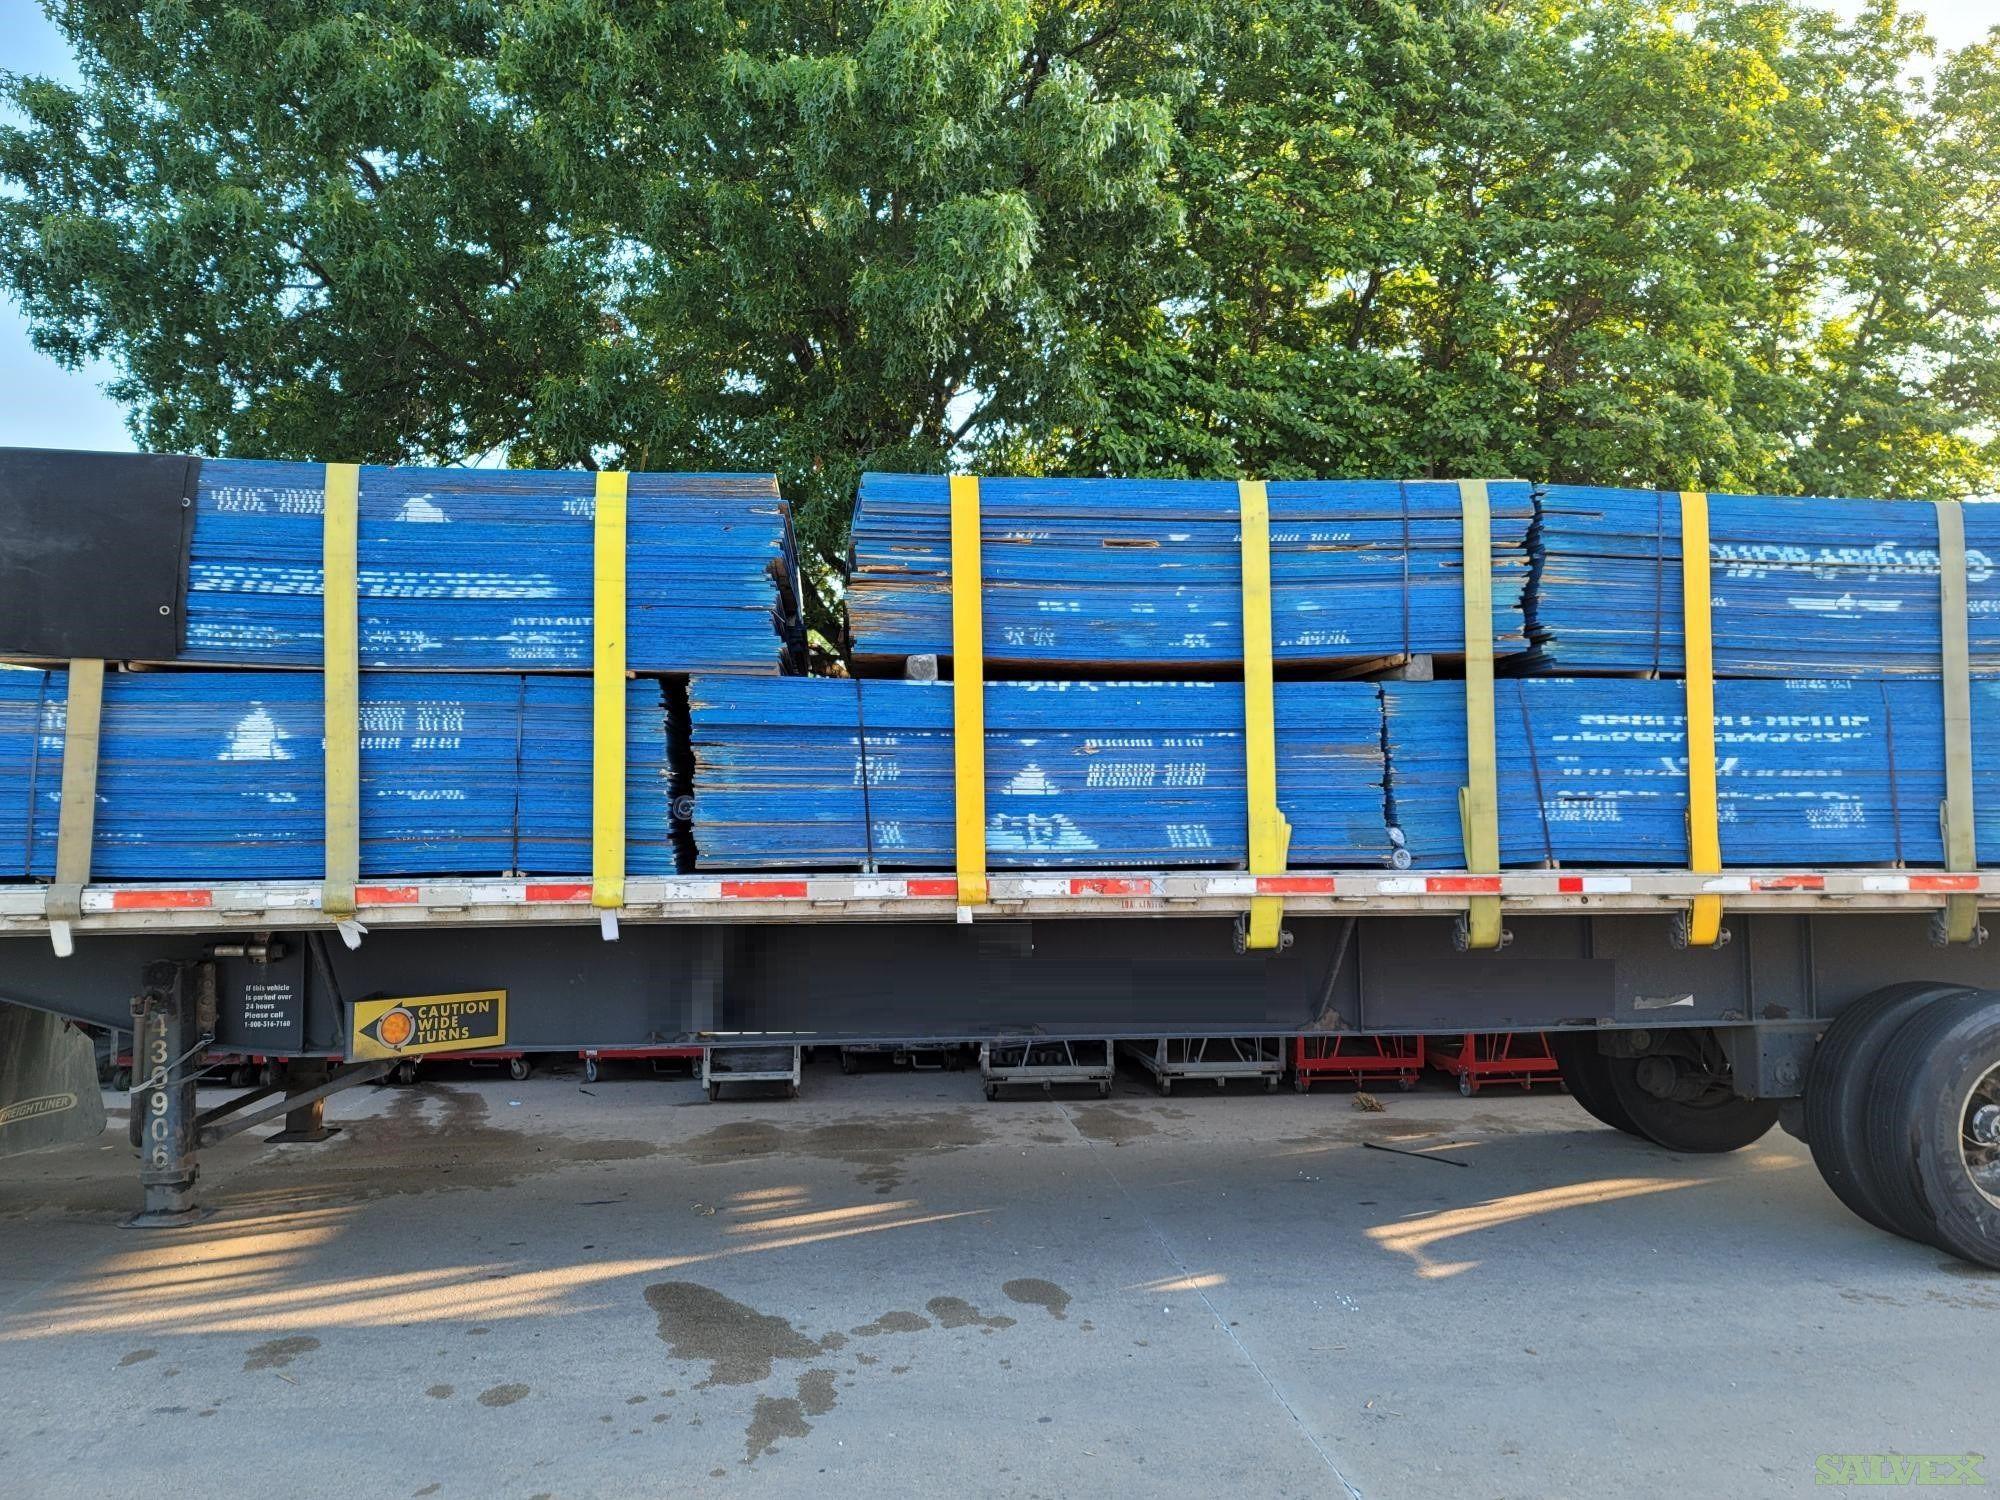 Subflooring : 7/16 CAT OSB RTD SHTG EXP1 24/16  and 19/32 CAT OSB RTD SUBFLOOR - 761 Pieces in Indiana